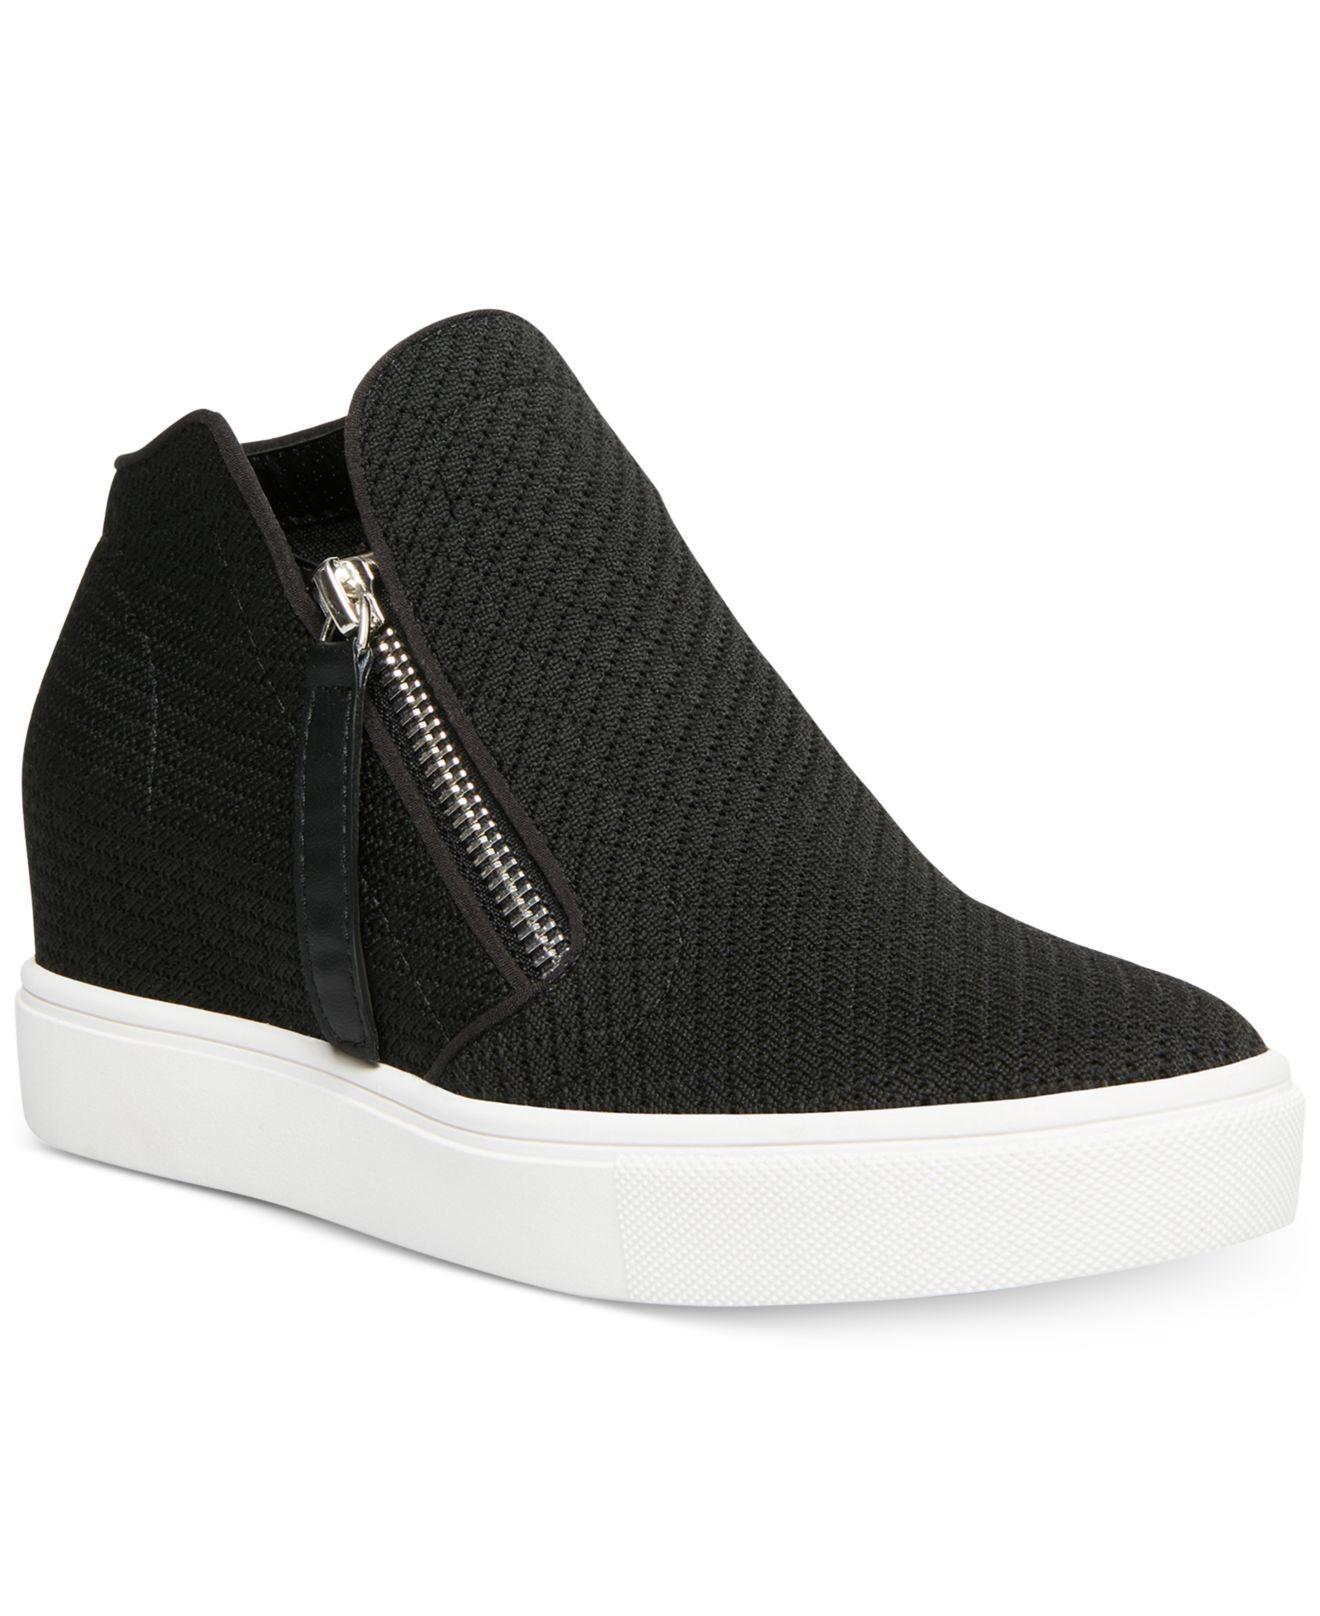 80e78bde603 Women's Black Camden Knit Wedge Sneakers